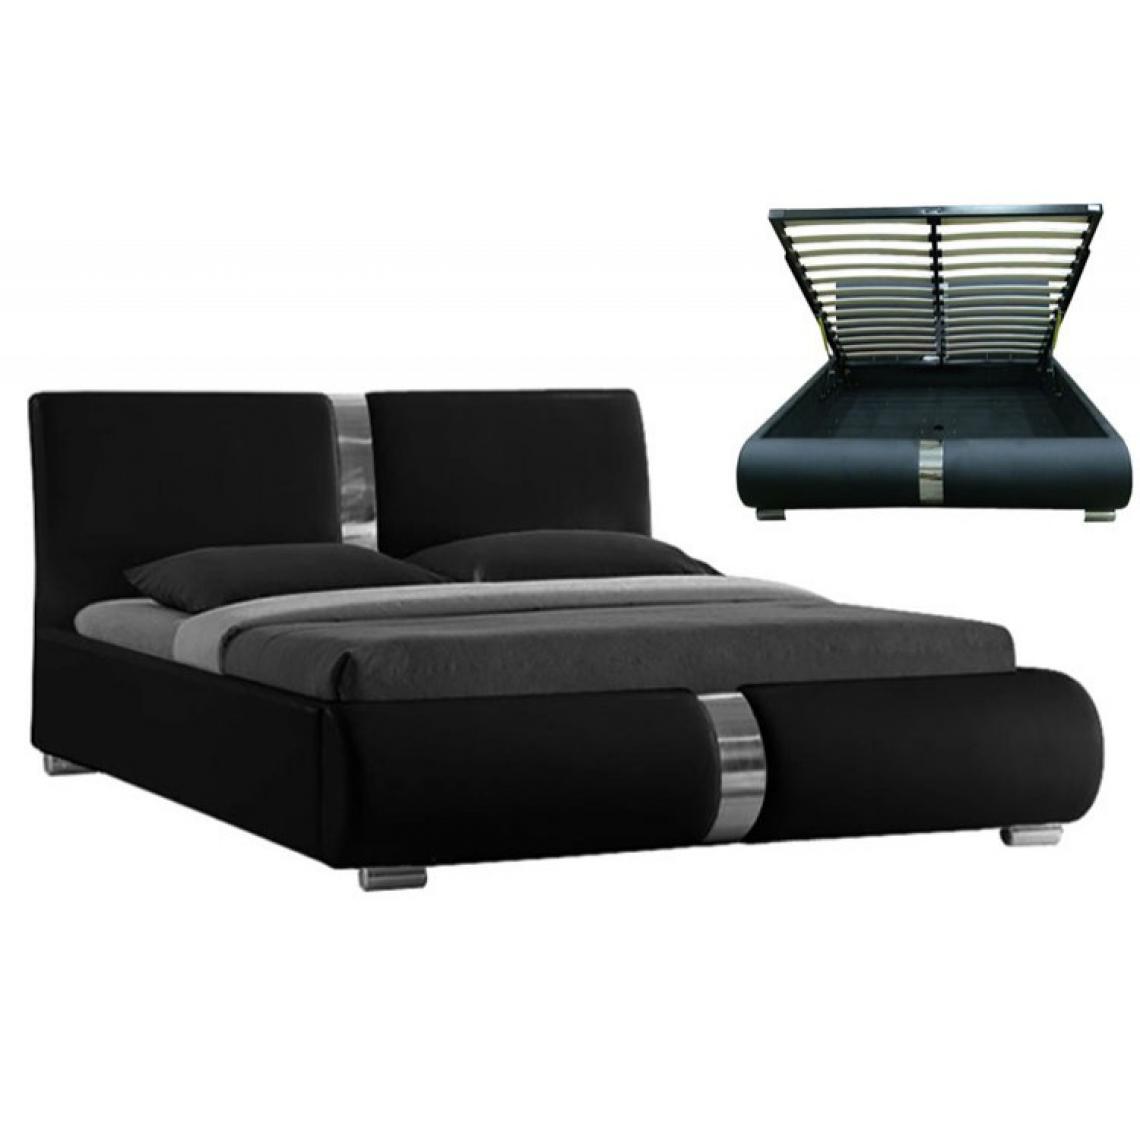 lit coffre sommier relevable noir 160 cm baleno 3 suisses. Black Bedroom Furniture Sets. Home Design Ideas